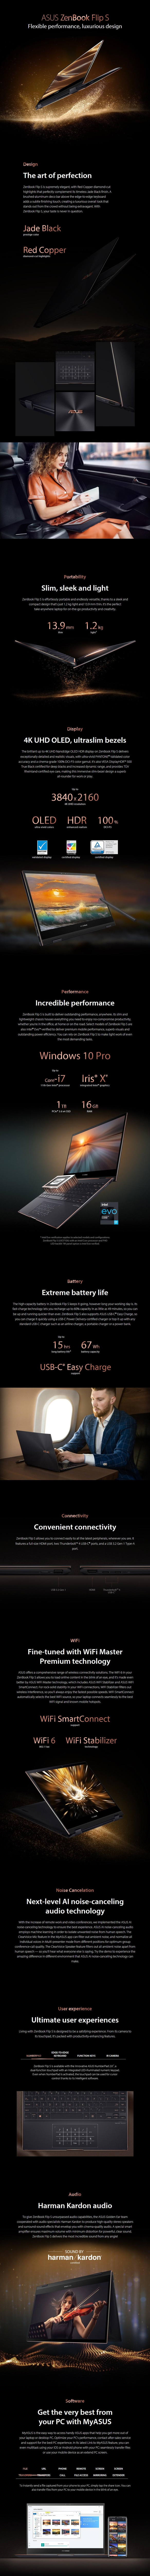 asus-zenbook-flip-s-ux371ea-133-4k-oled-laptop-i71165g7-16gb-1tb-w10h-touch-ac39076-9.jpg